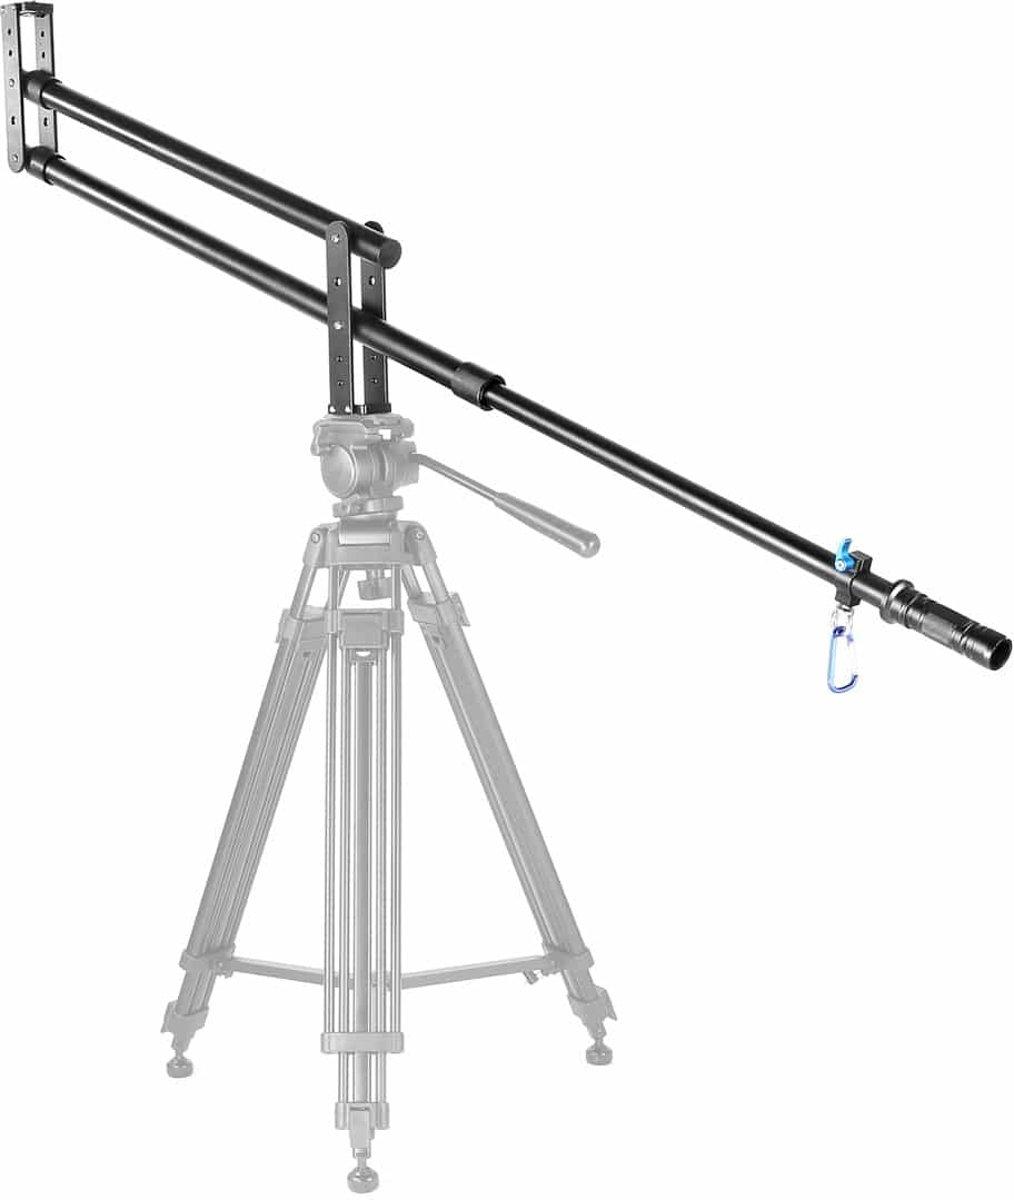 YELANGU YLG0110A draagbare camera kraan arm Jib voor DSLR-camera's, lengte: 2m, Max laadgewicht: 5kg (zwart) kopen